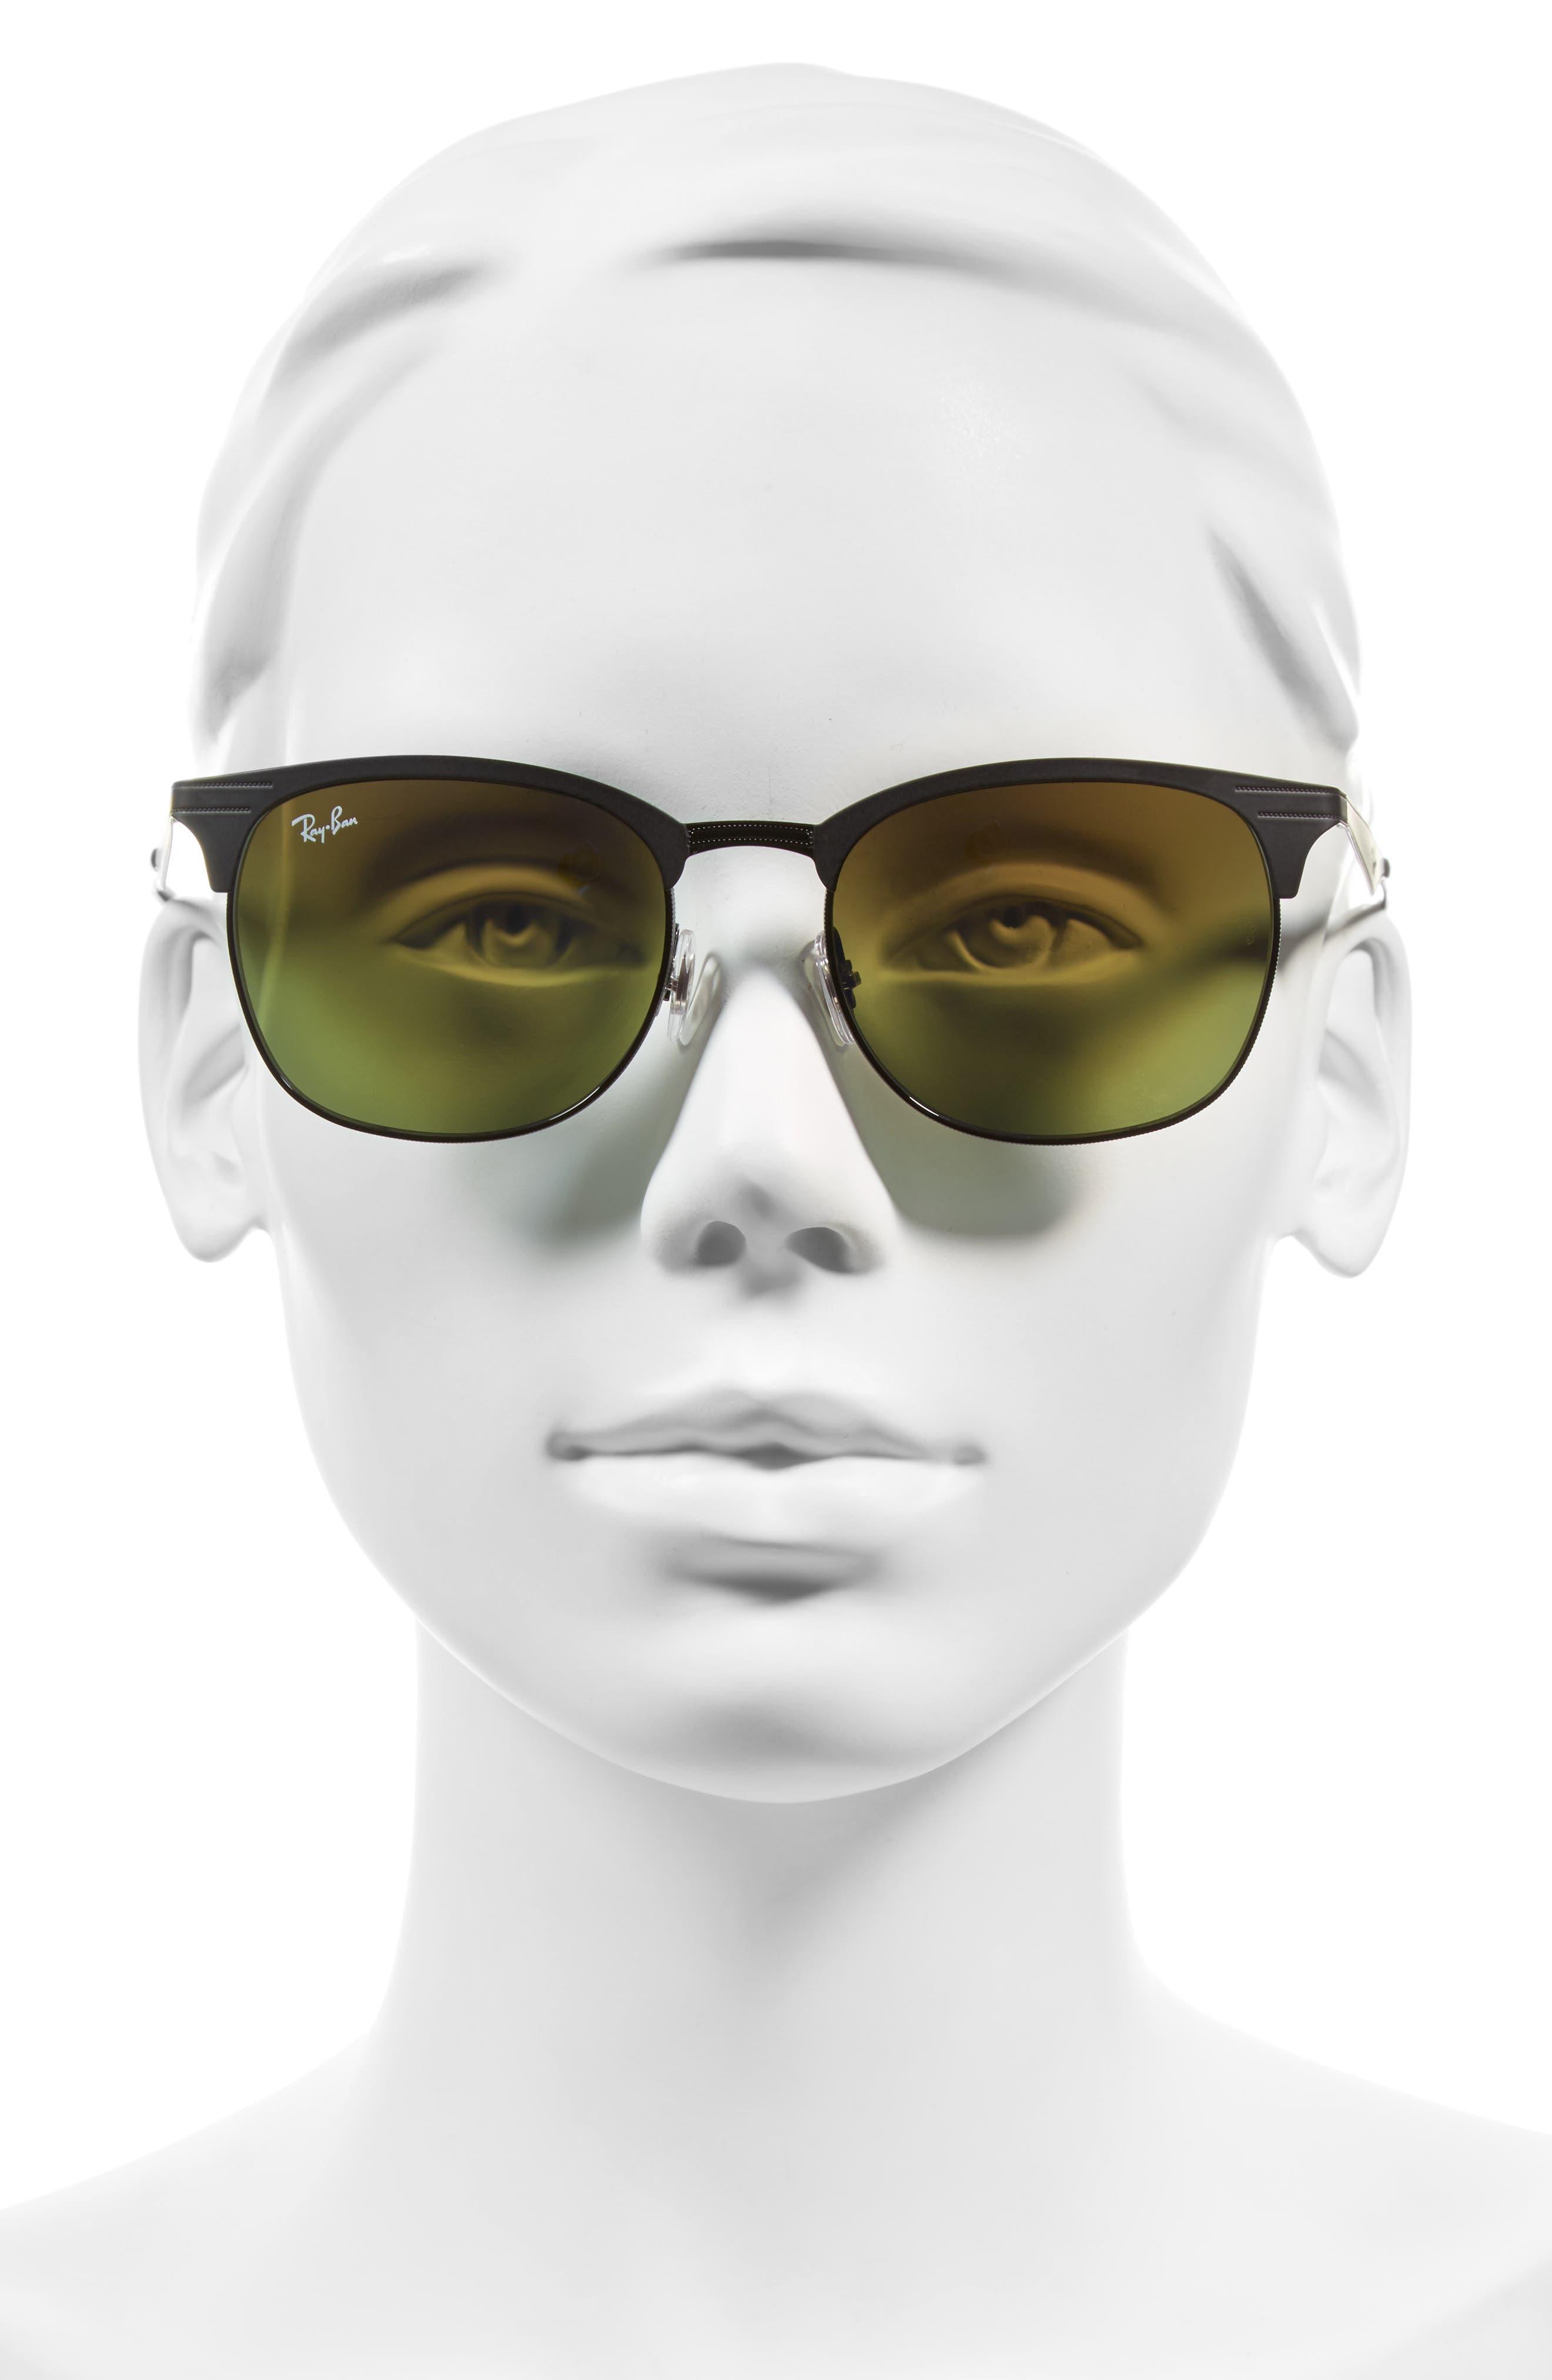 Highstreet 53mm Sunglasses,                             Alternate thumbnail 2, color,                             001